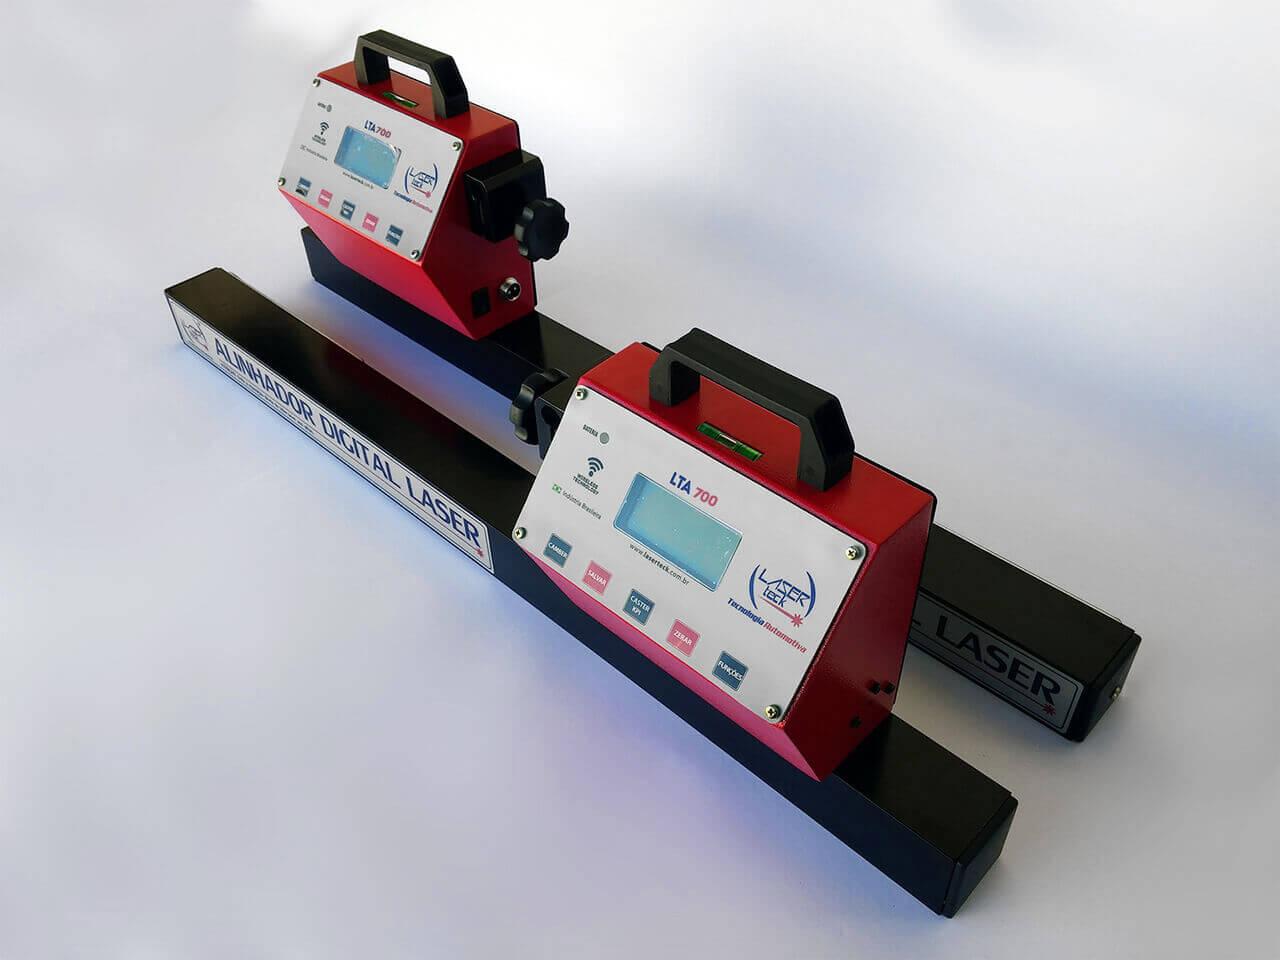 Alinhador digital LTA 700